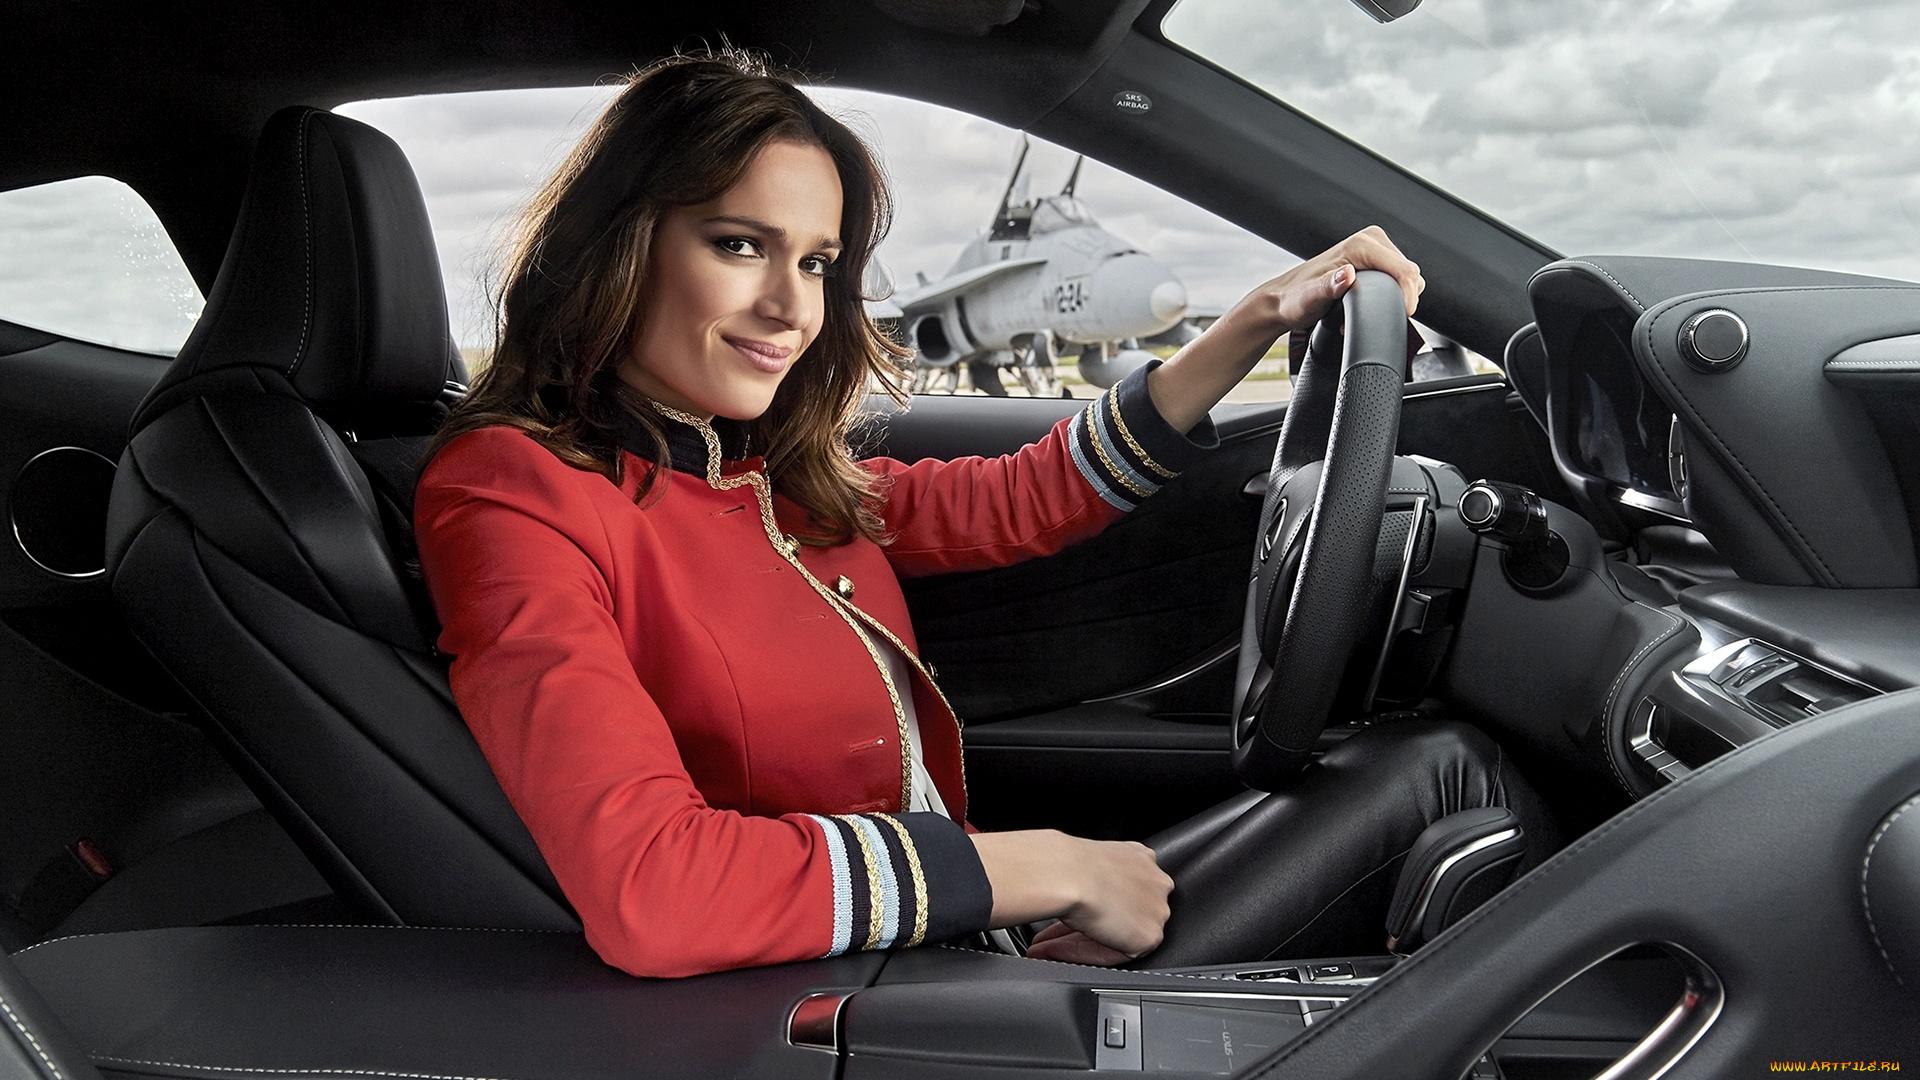 Картинки девушки за рулем машины